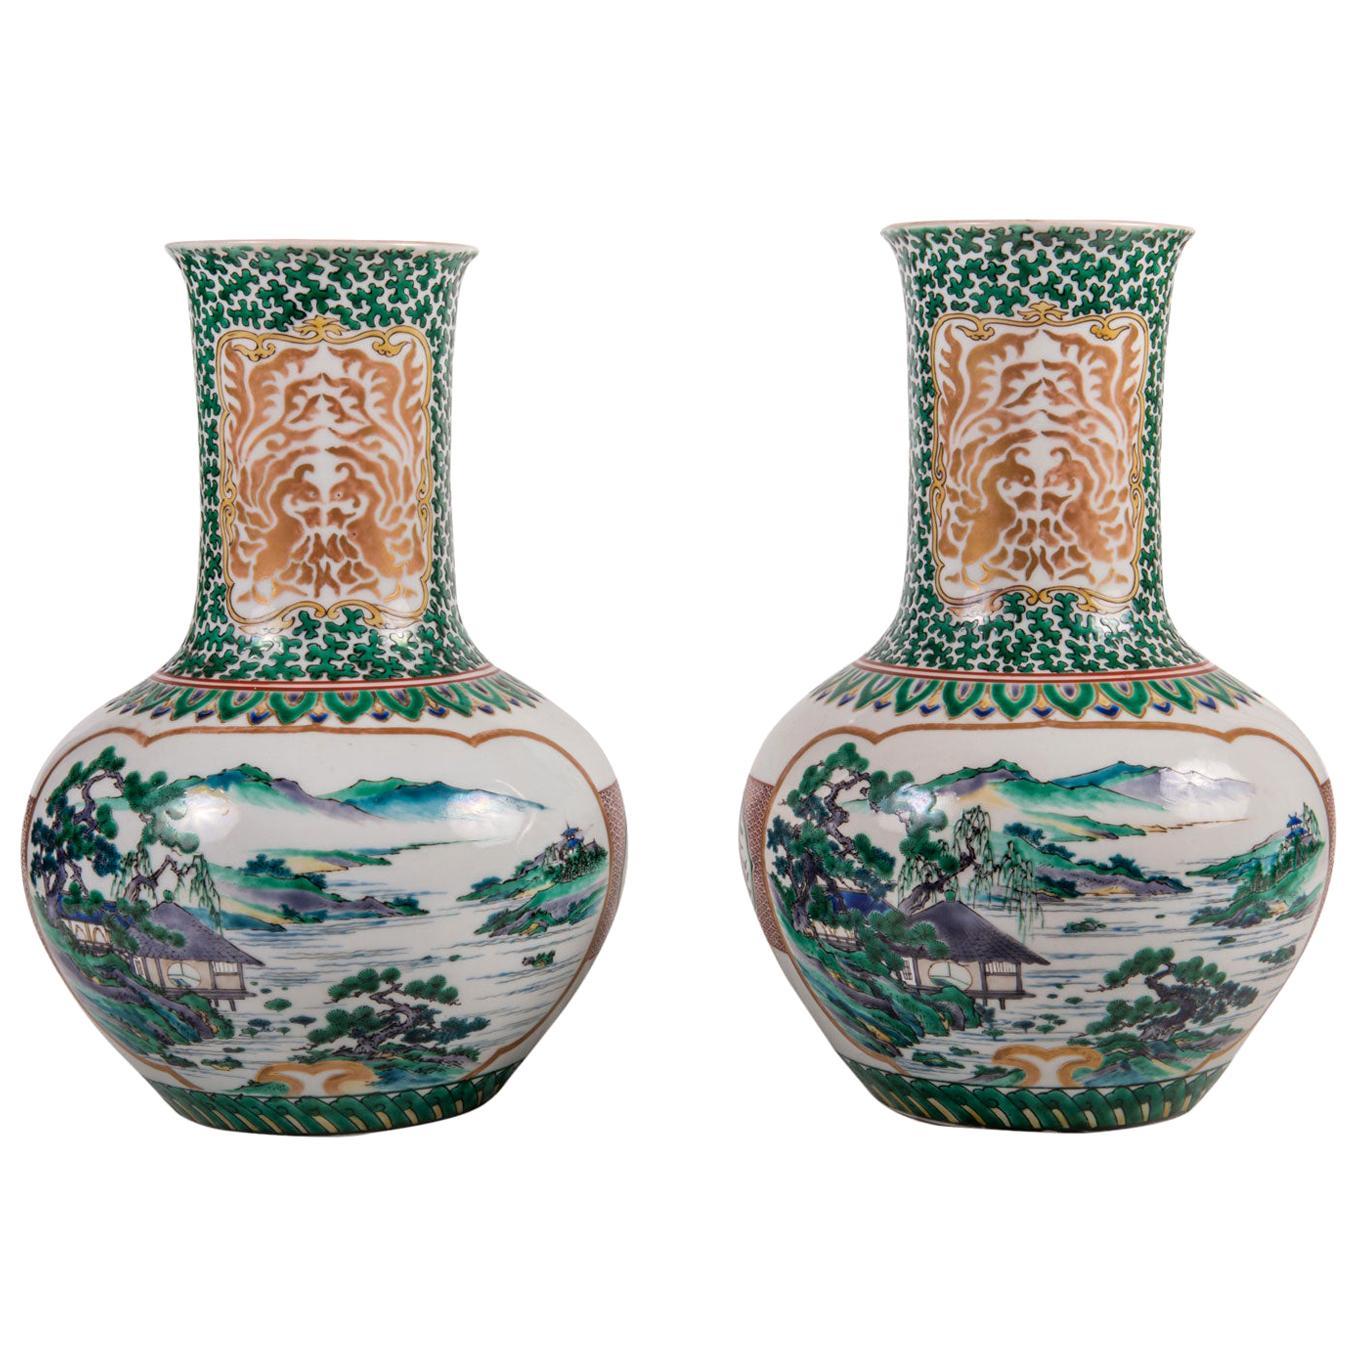 Pair of Japanese Kutani Porcelain Vases, circa 1900